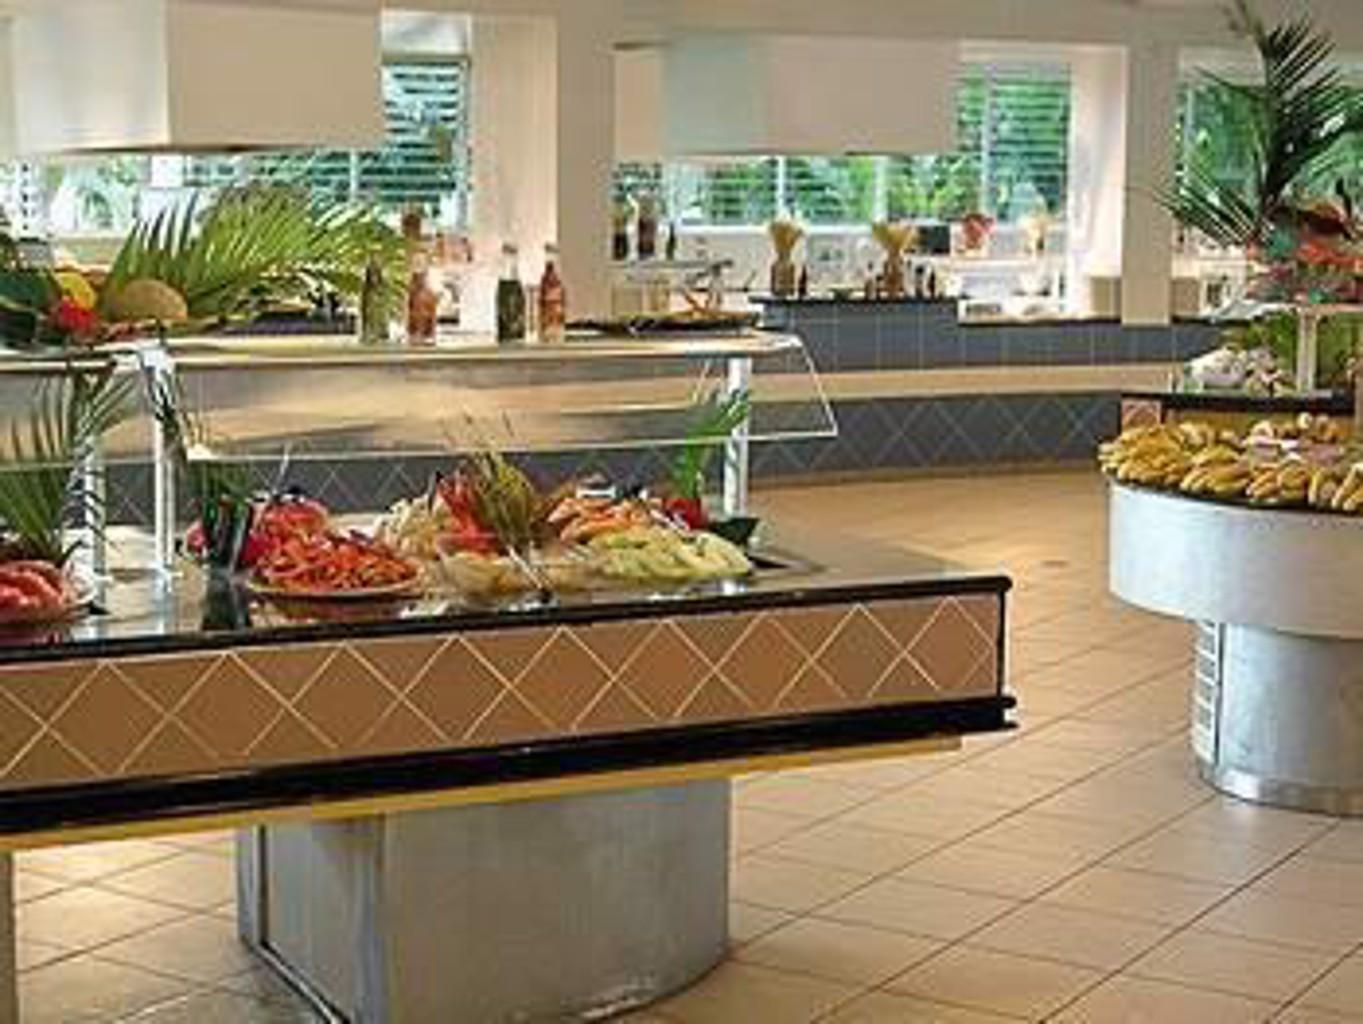 Gallery image of Breezes Resort & Spa Trelawny